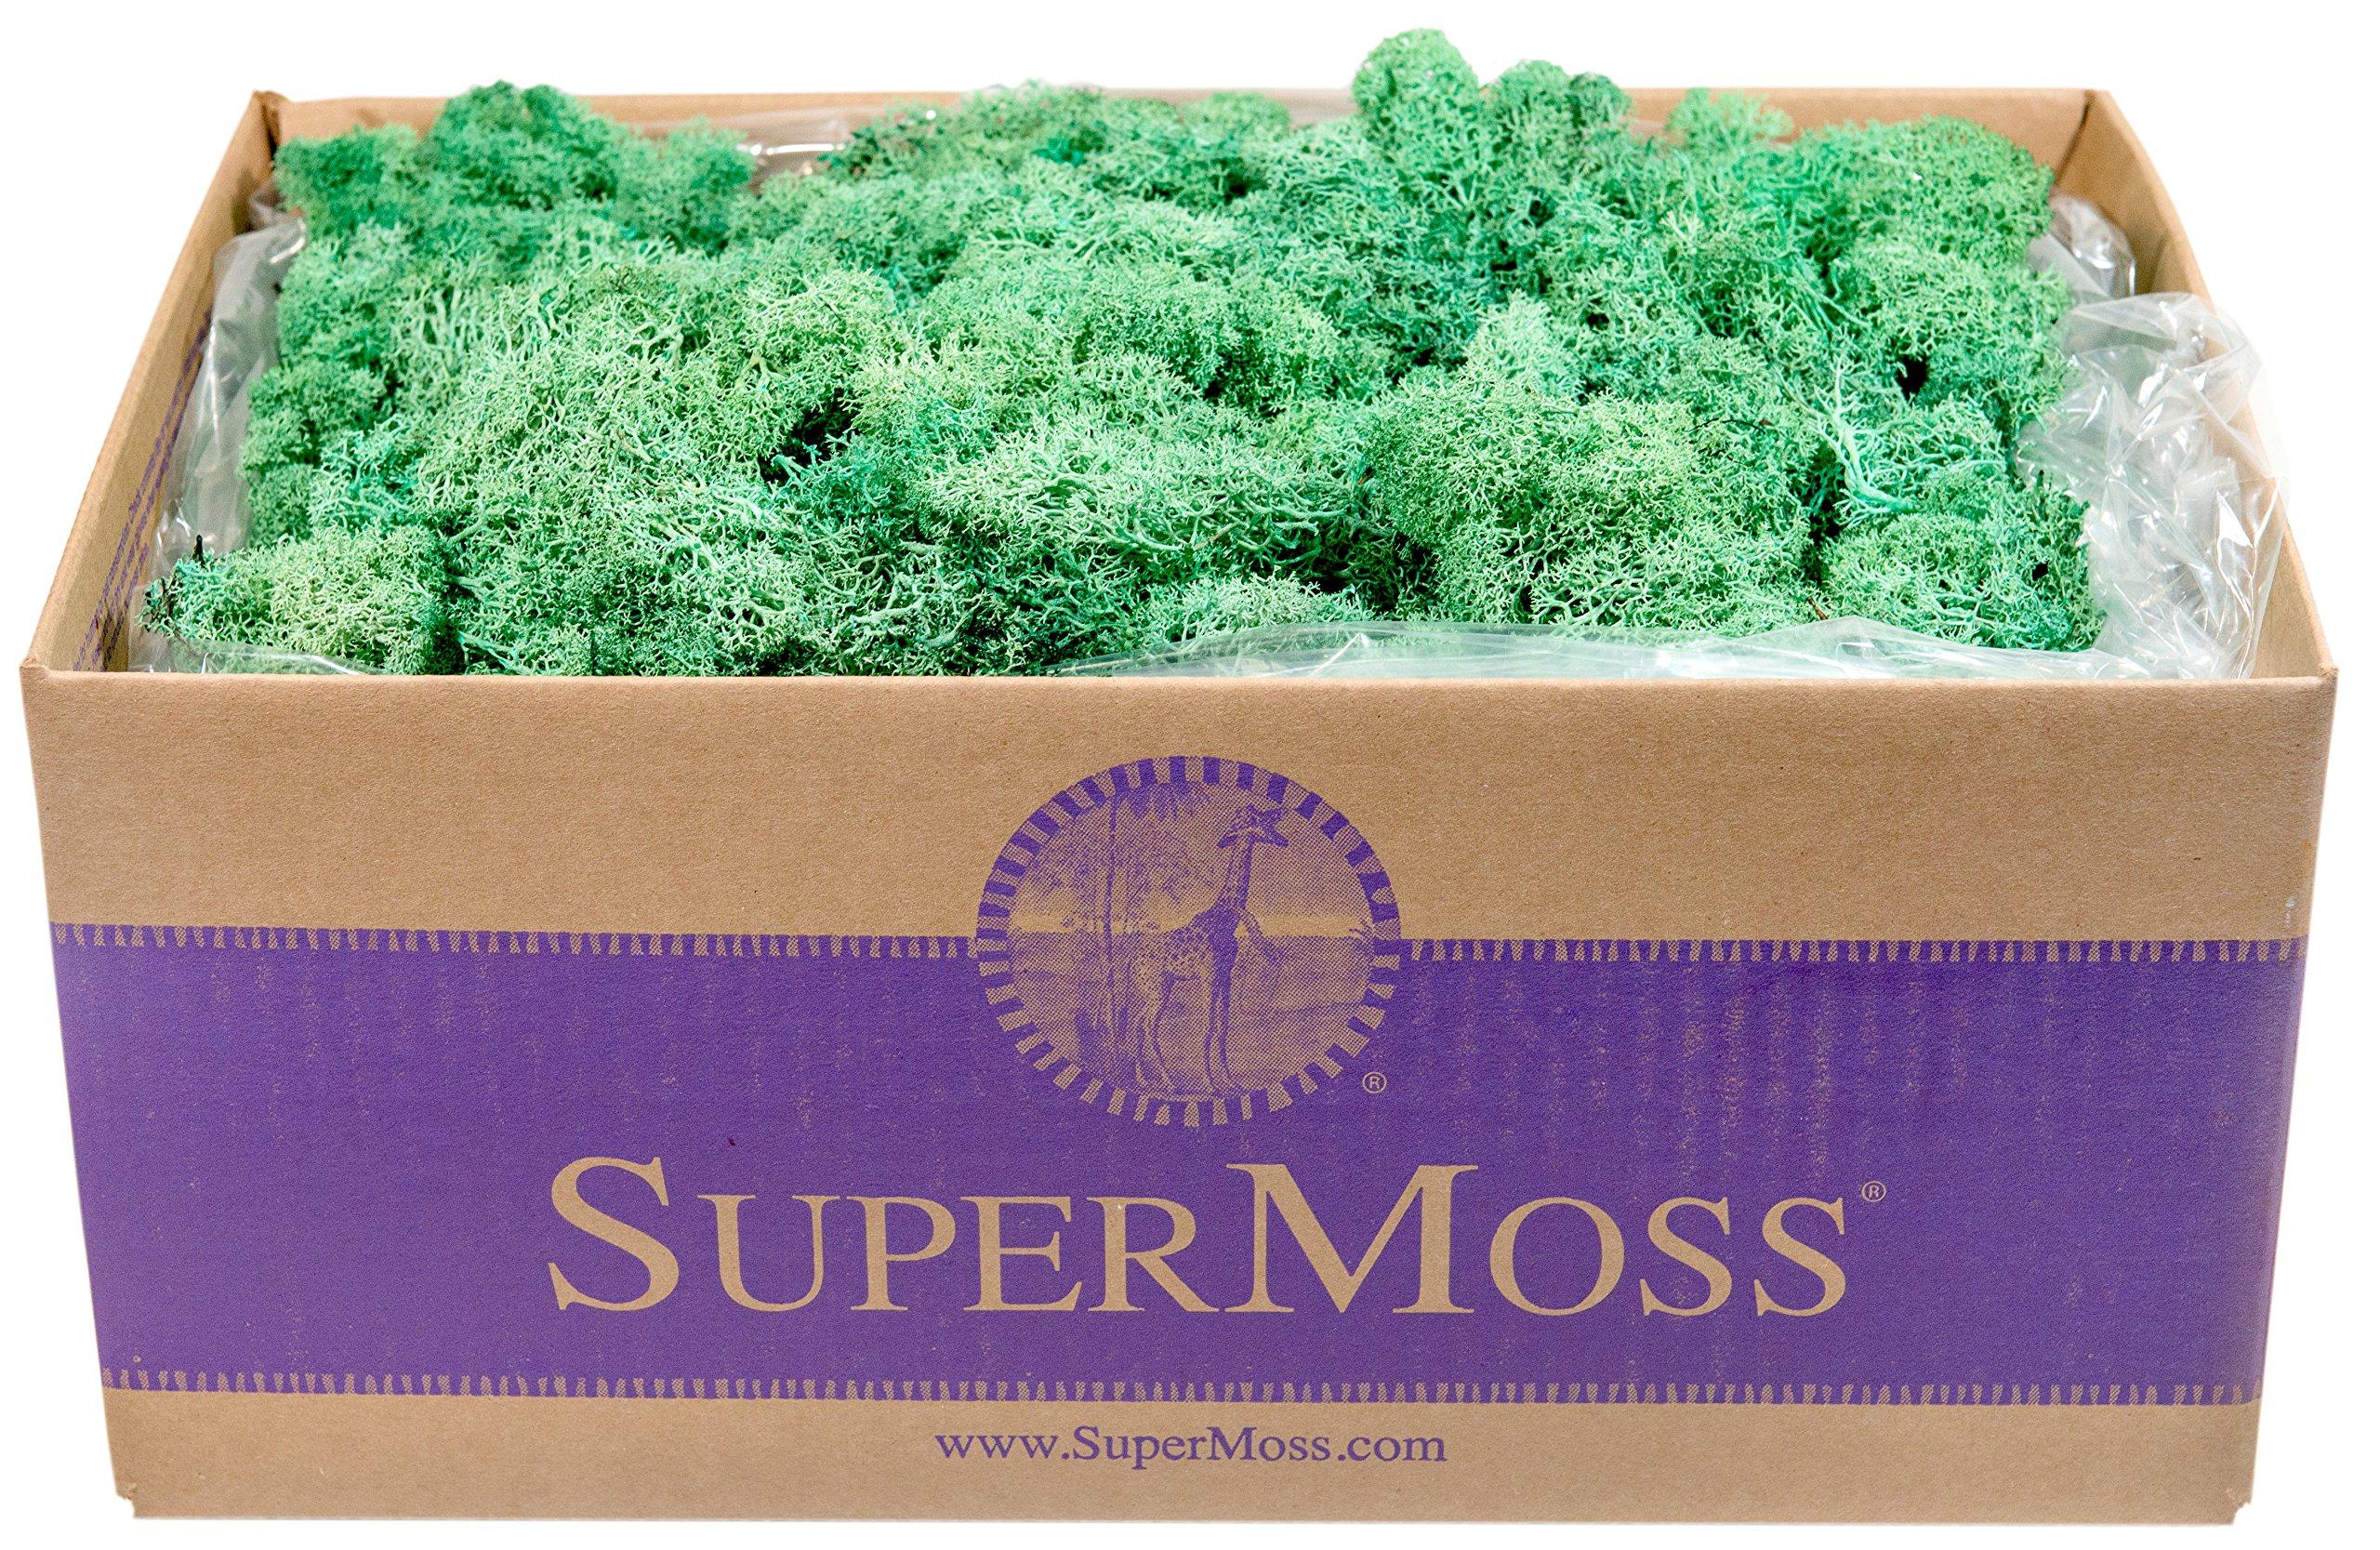 SuperMoss (23138) Reindeer Moss Preserved Box, 3) lb, Mint by Super Moss (Image #1)